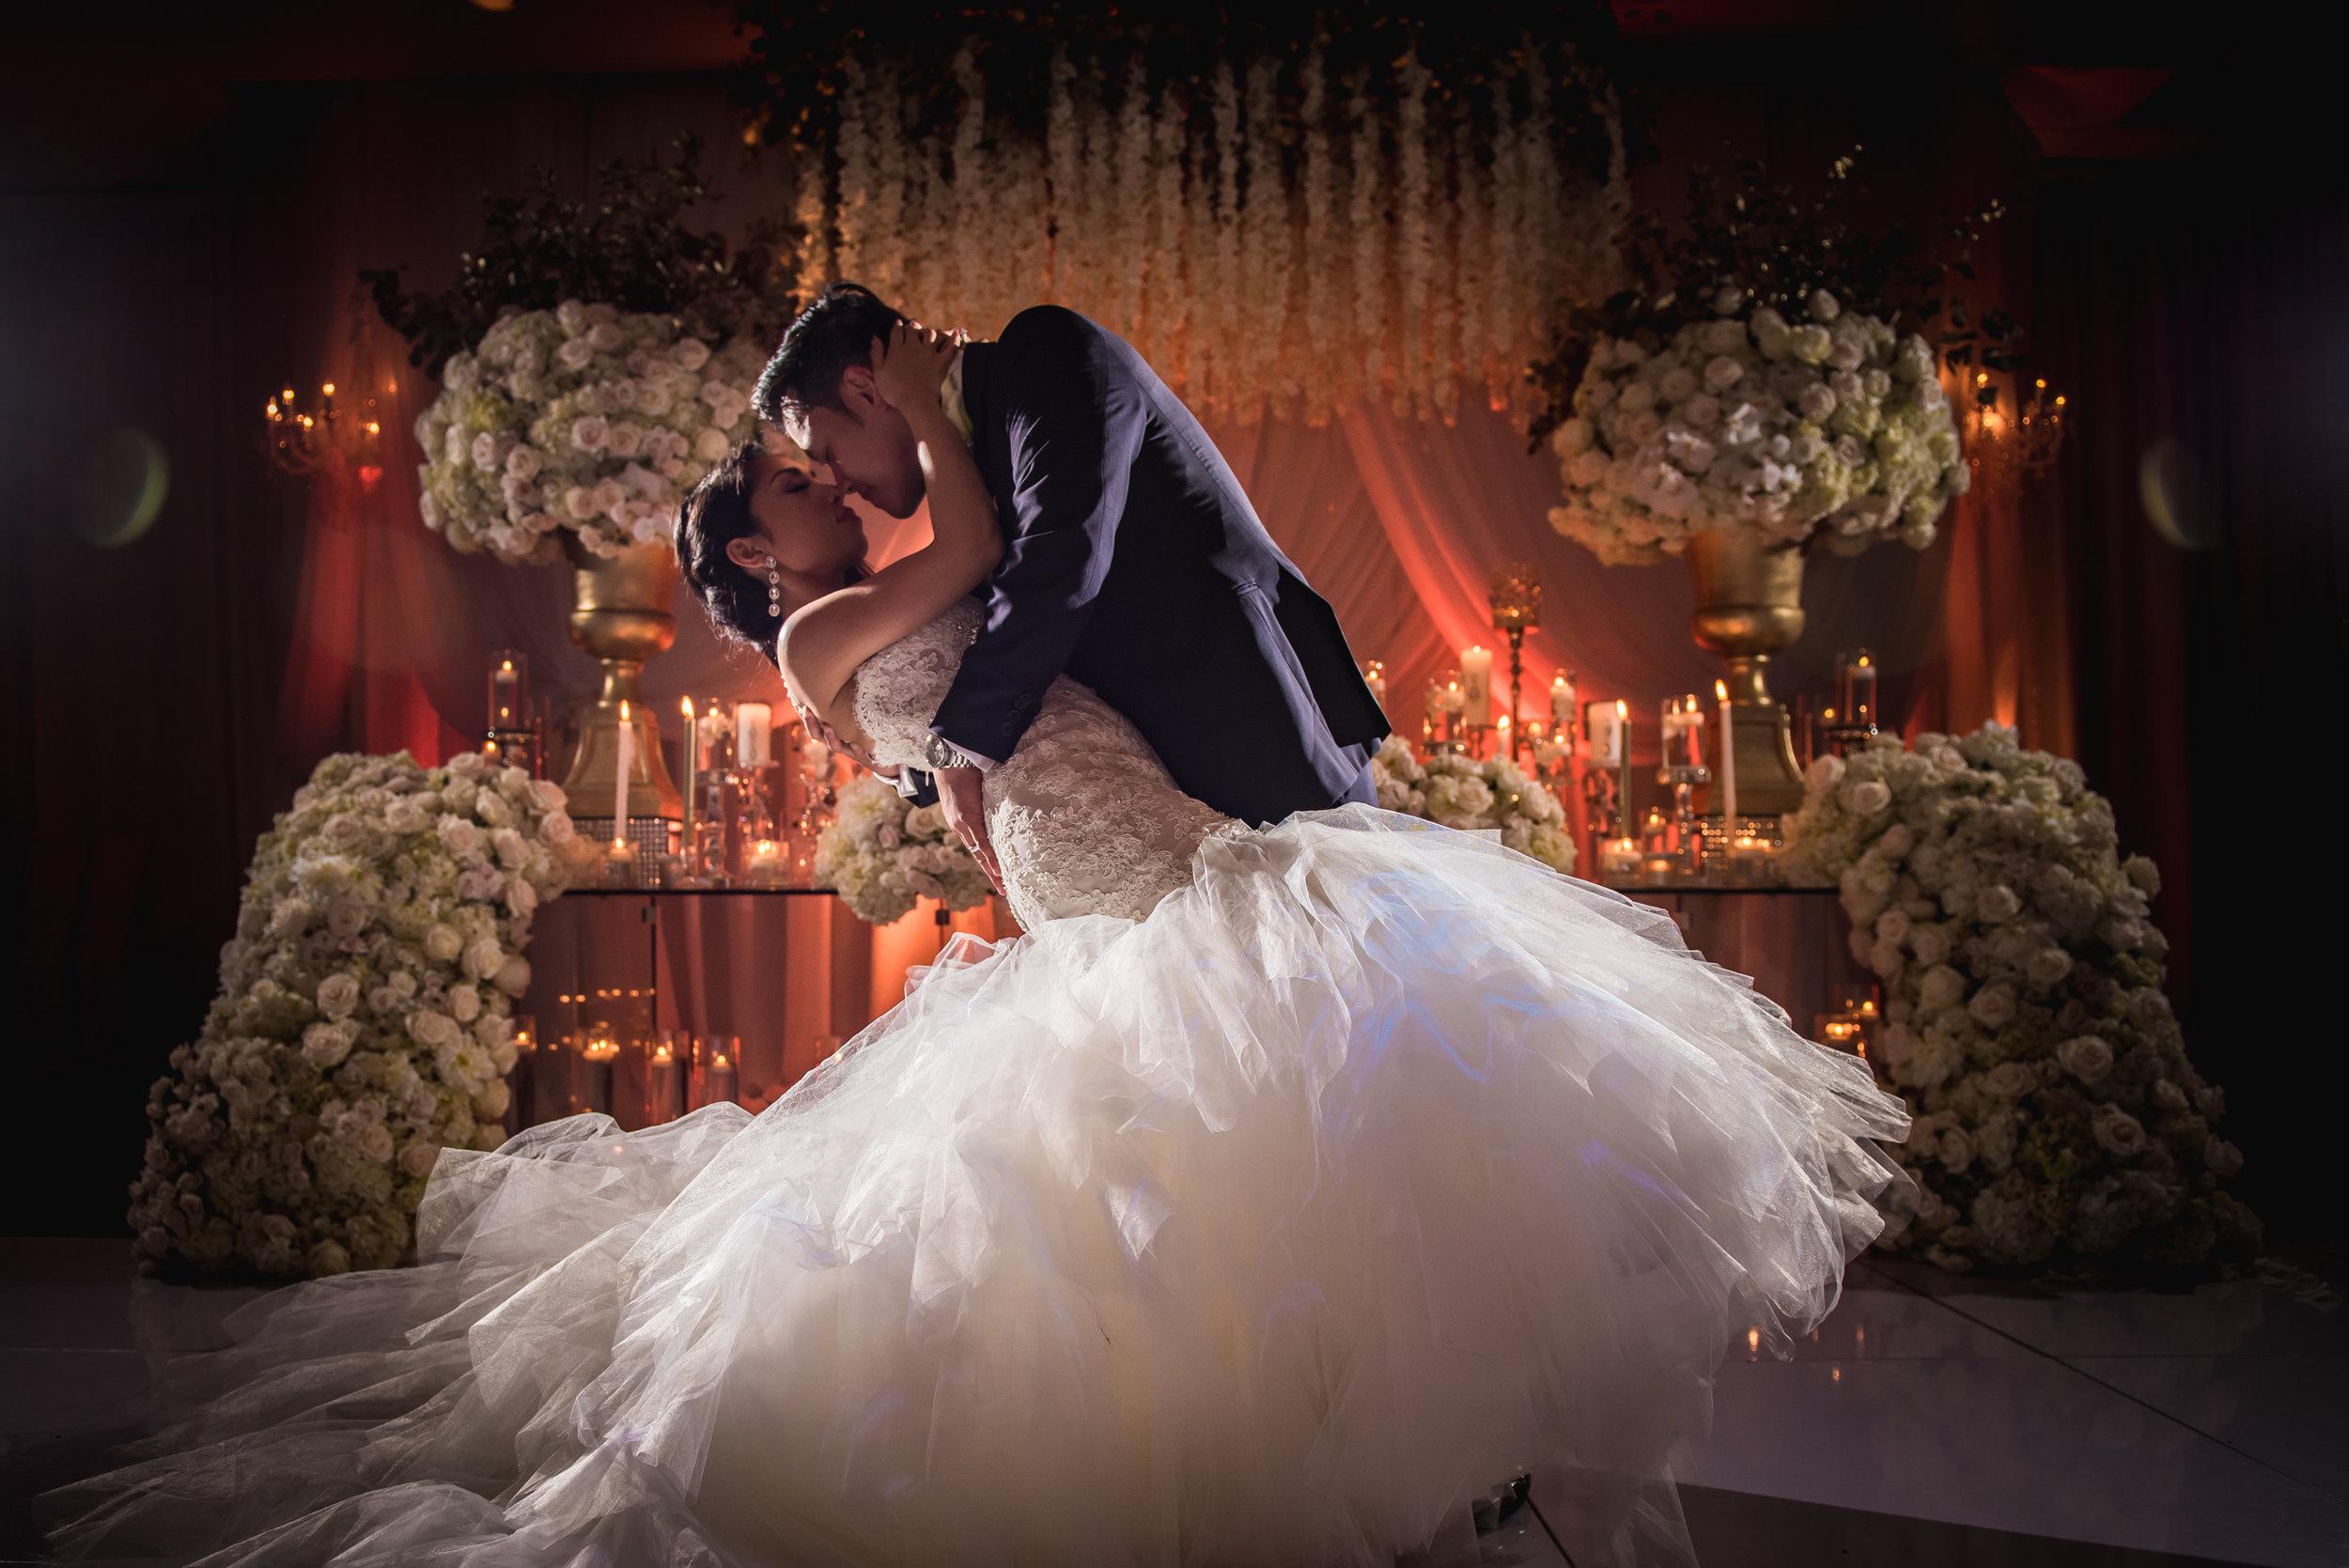 julie-tinh-wedding-full-set-129.jpg